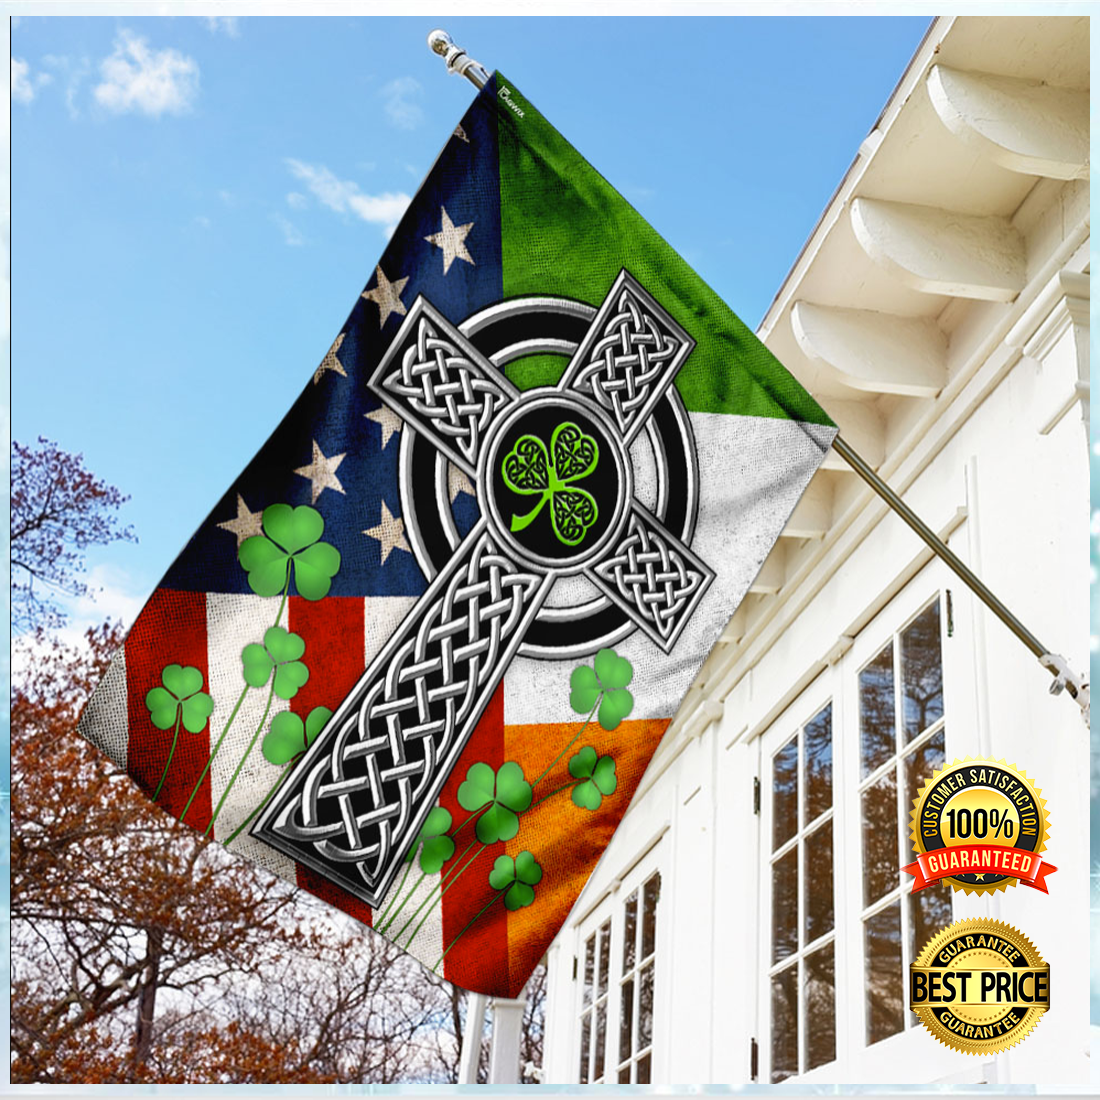 [NEW] IRISH CELTIC KNOT CROSS FLAG